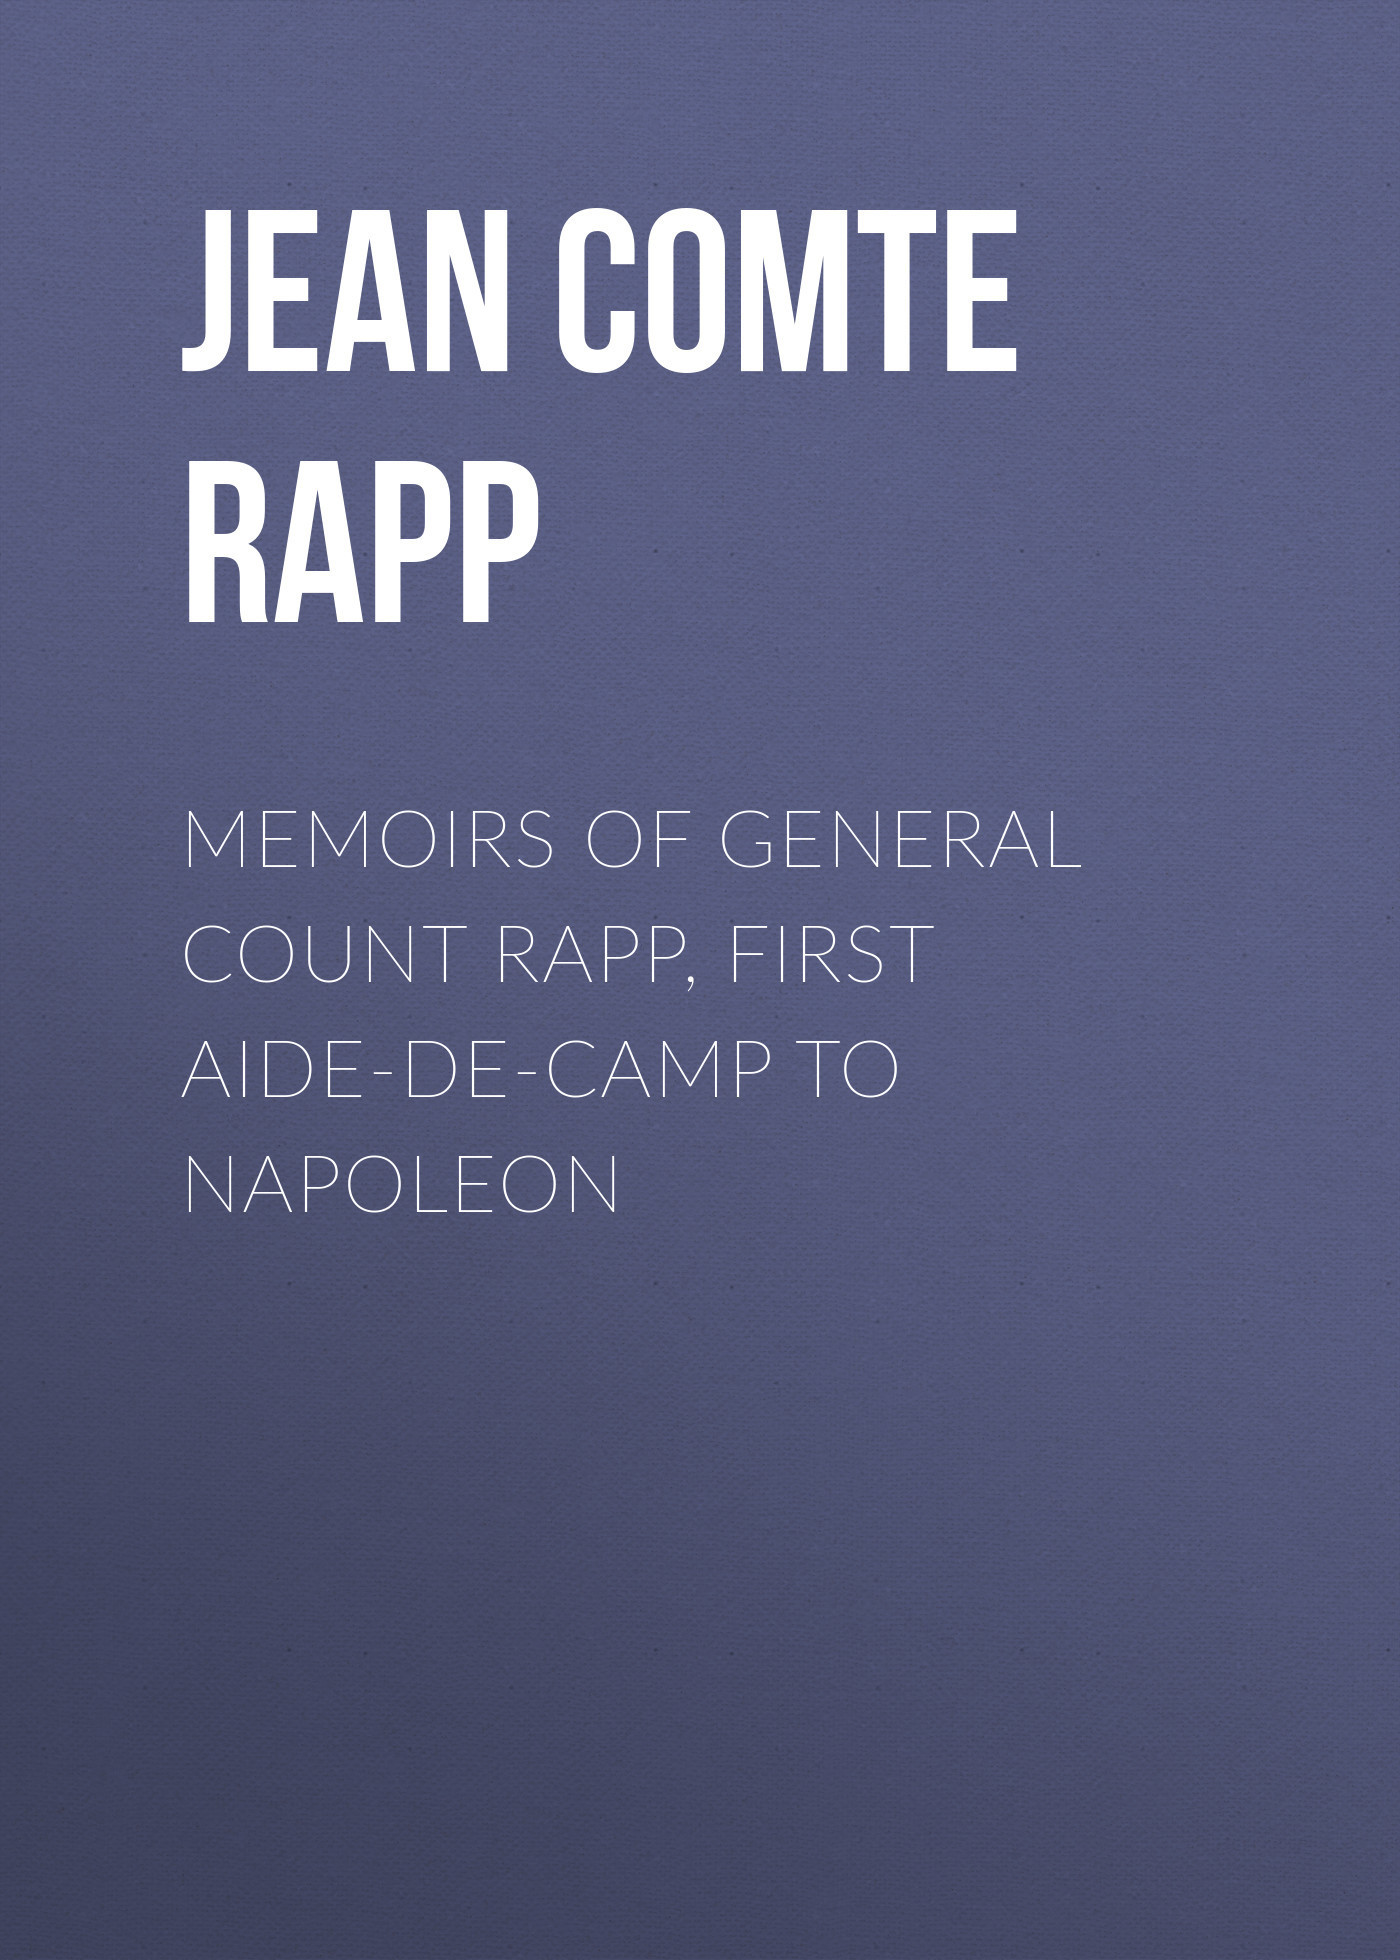 Jean Comte Rapp Memoirs of General Count Rapp, First aide-de-camp to Napoleon